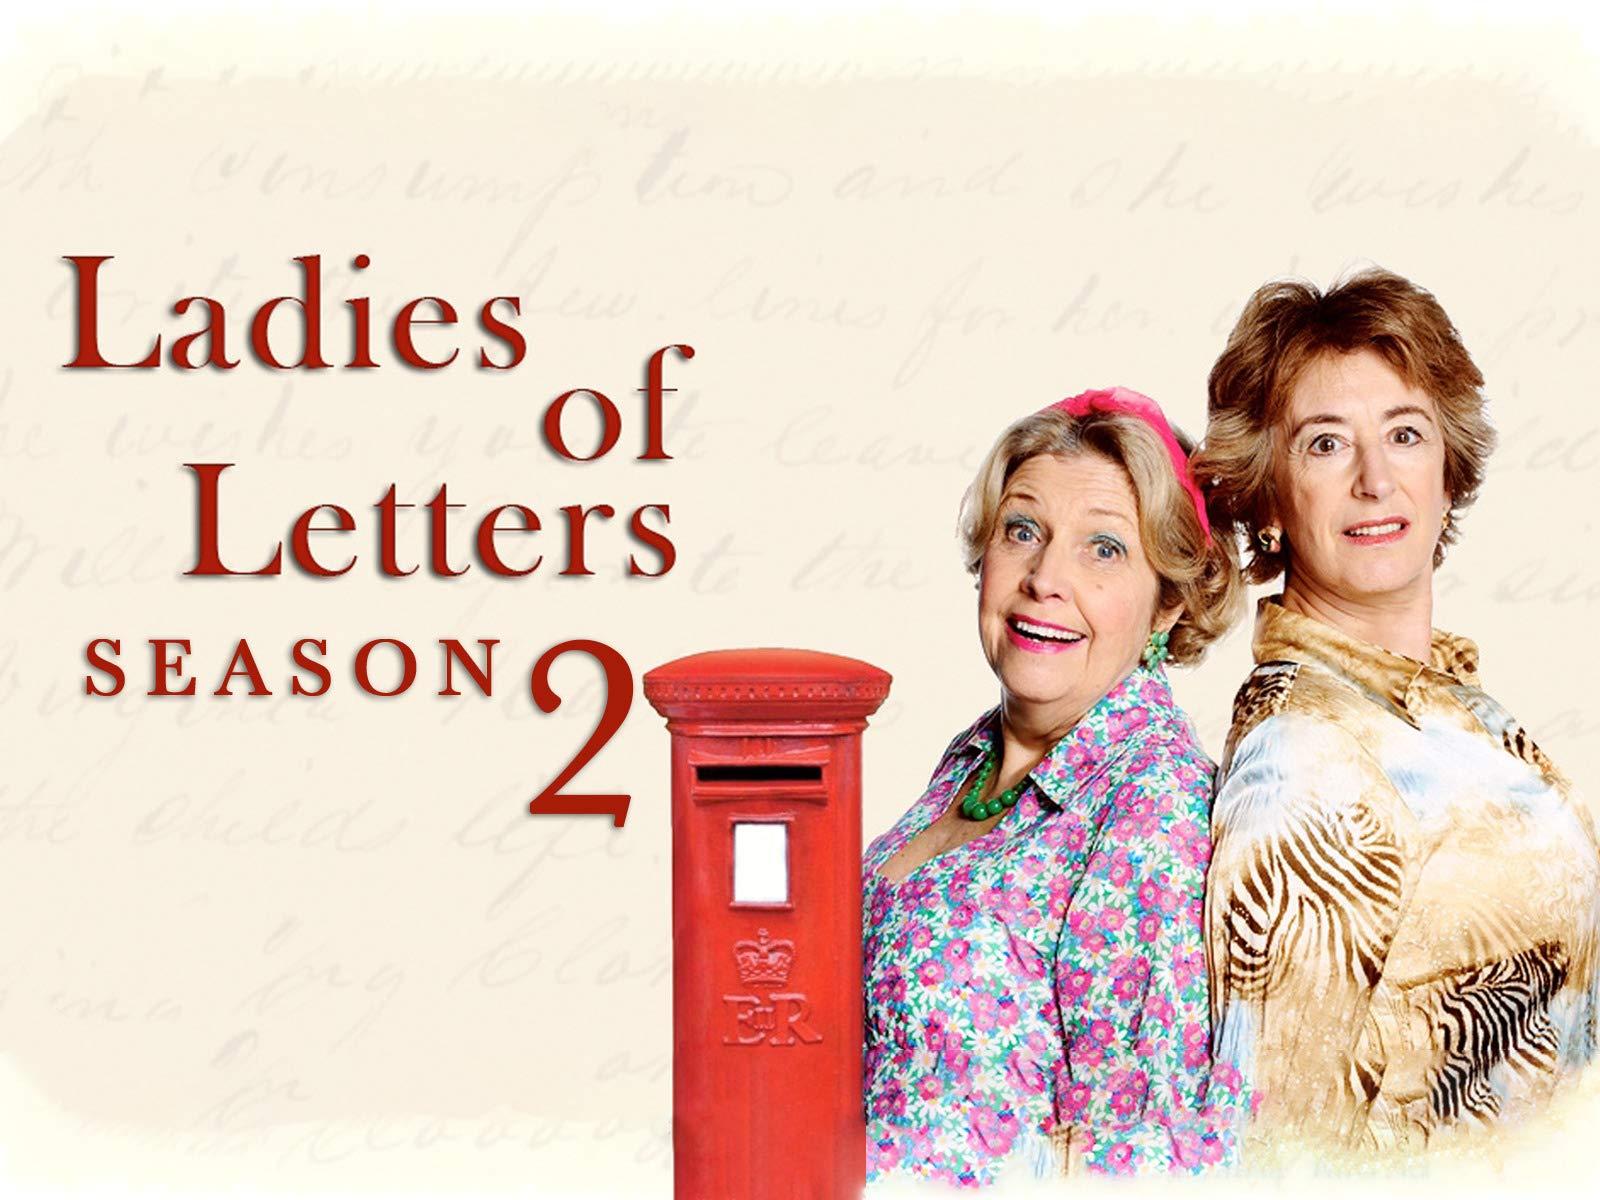 Ladies of Letters - Season 2